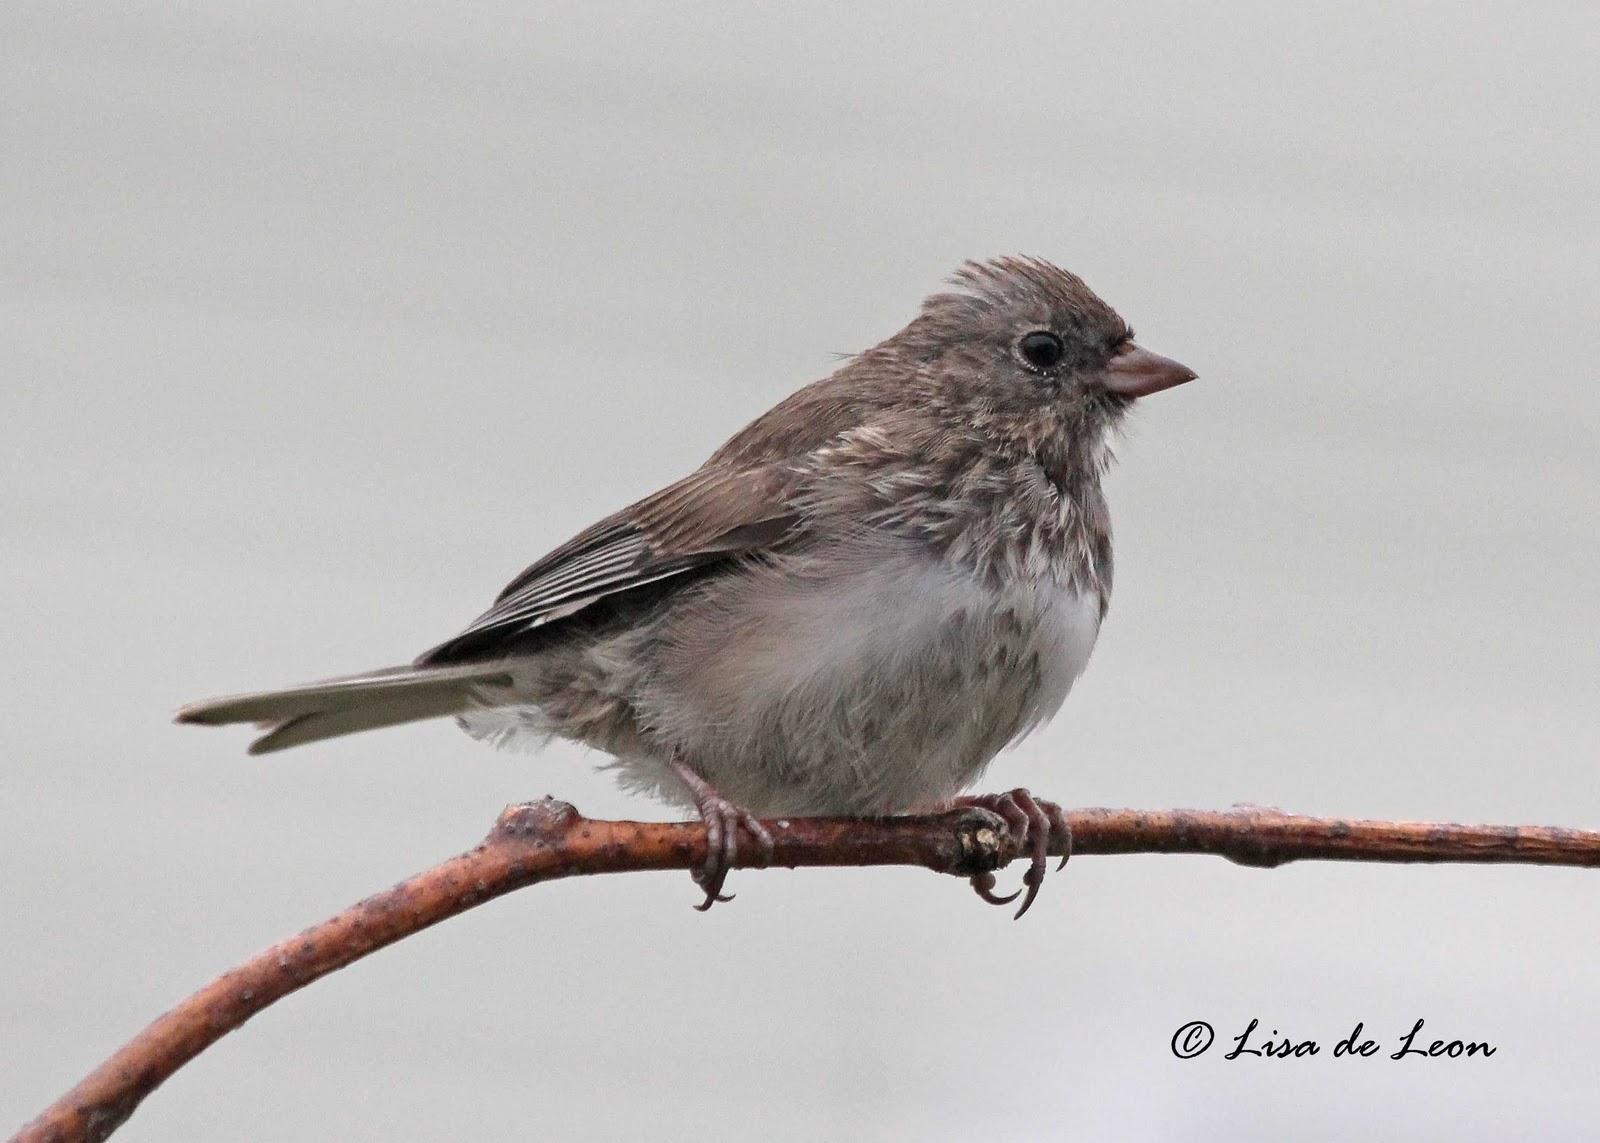 Birding with Lisa de Leon: Dark-eyed Junco - Juvenile